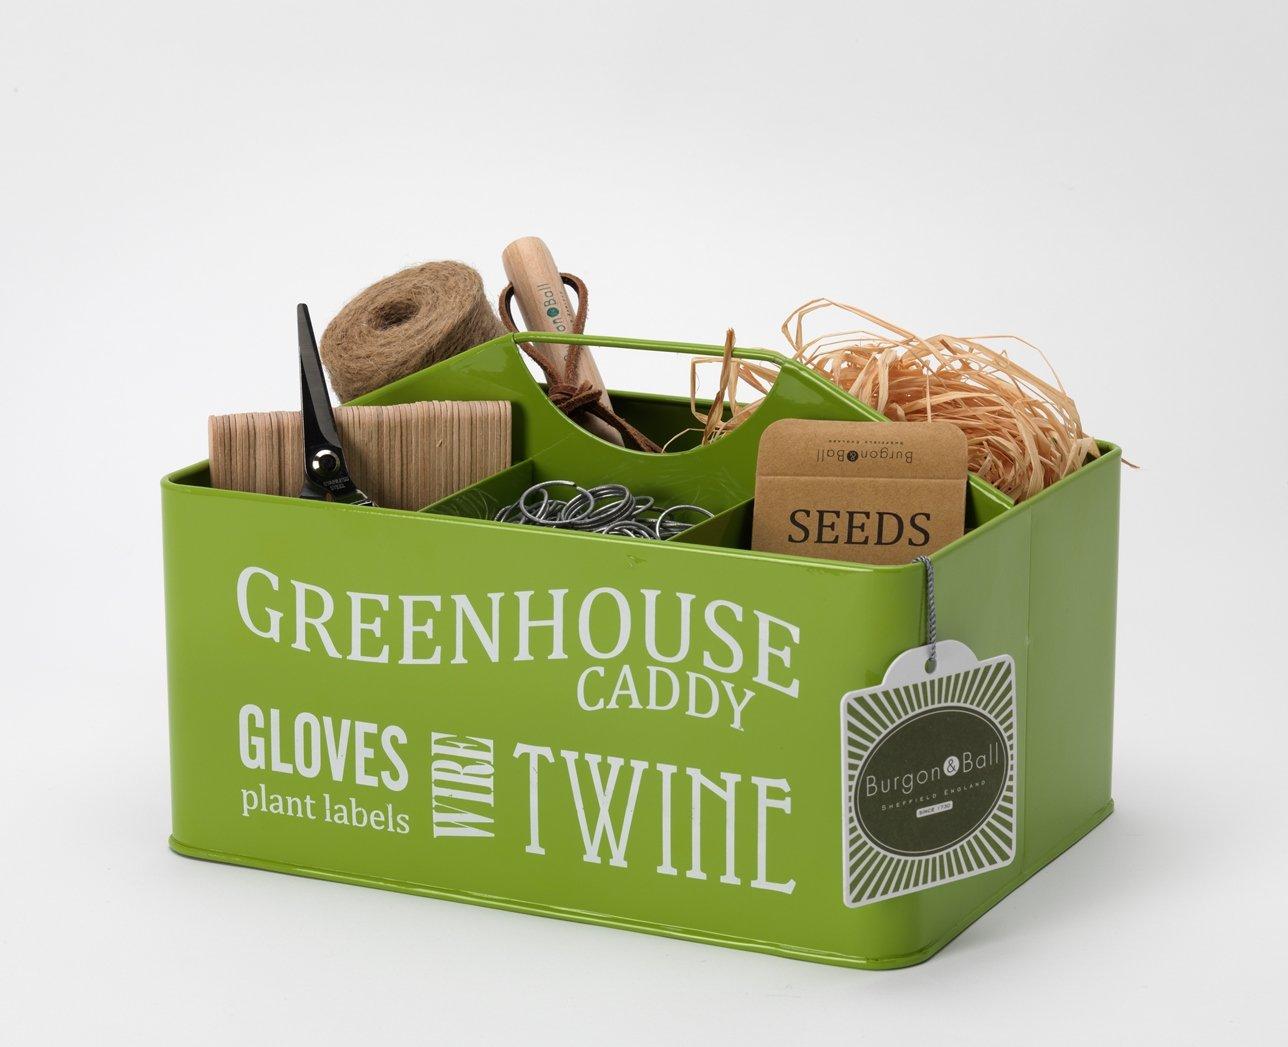 Burgon & Ball GYO/CADDY Greenhouse Caddy - Lime Green G0174